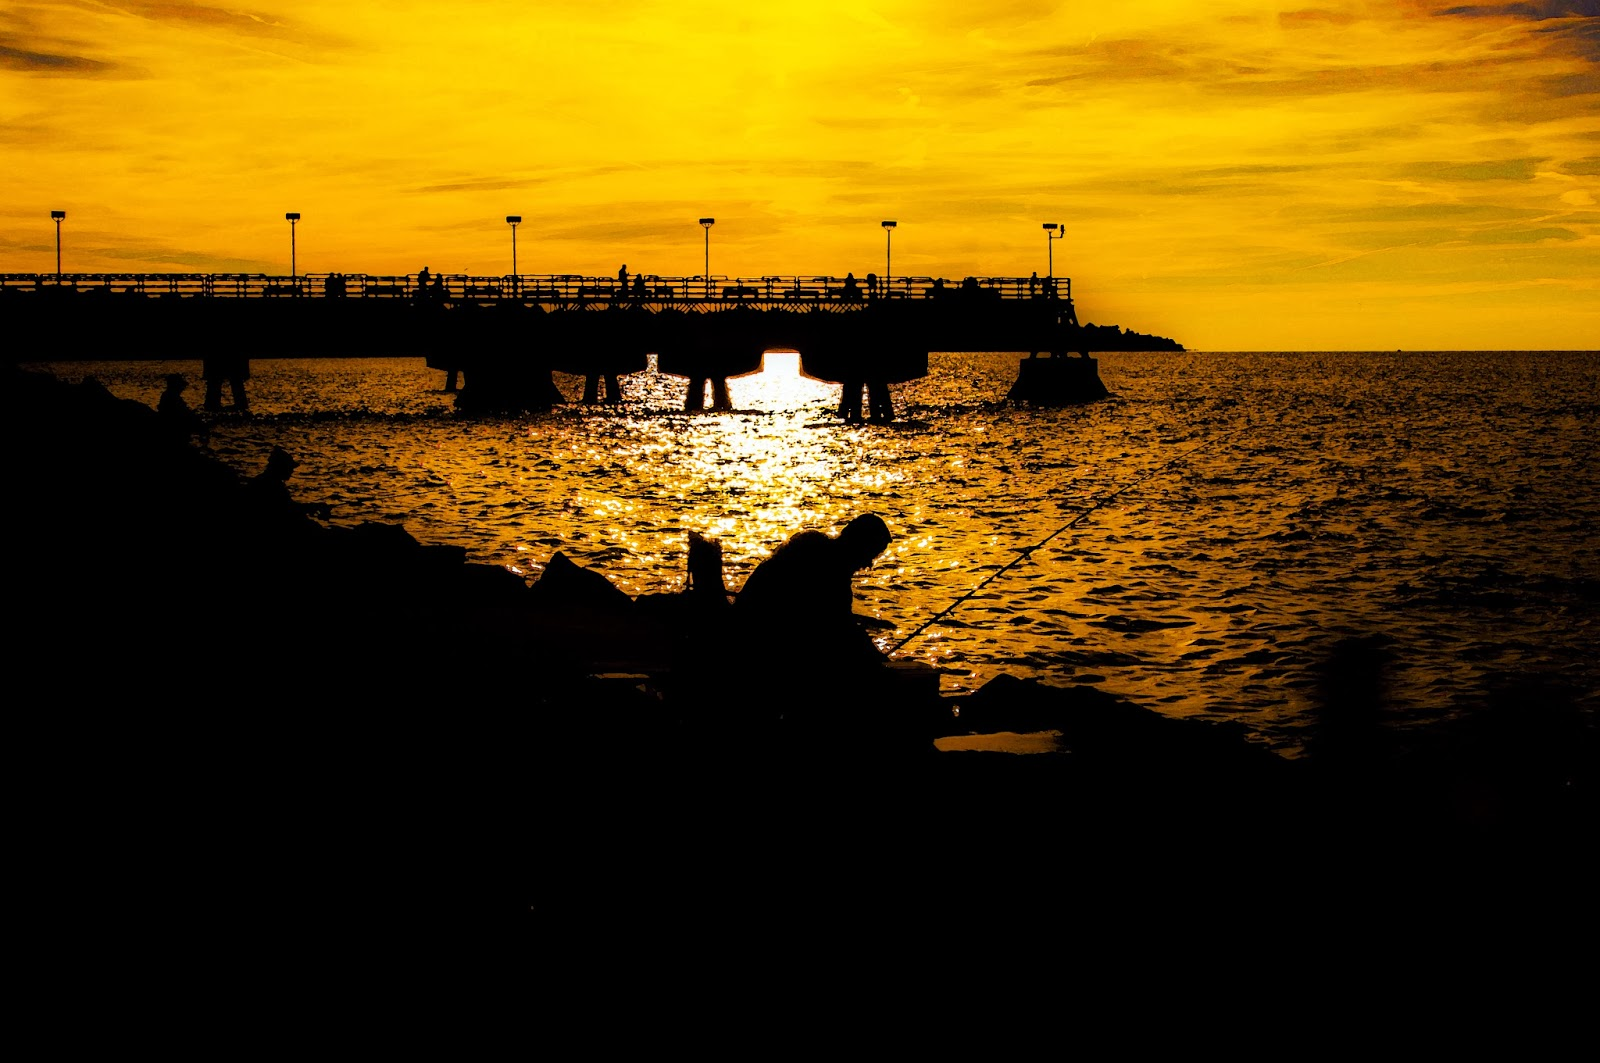 The irreverent psychologist edgewater fishing for light for The edge water